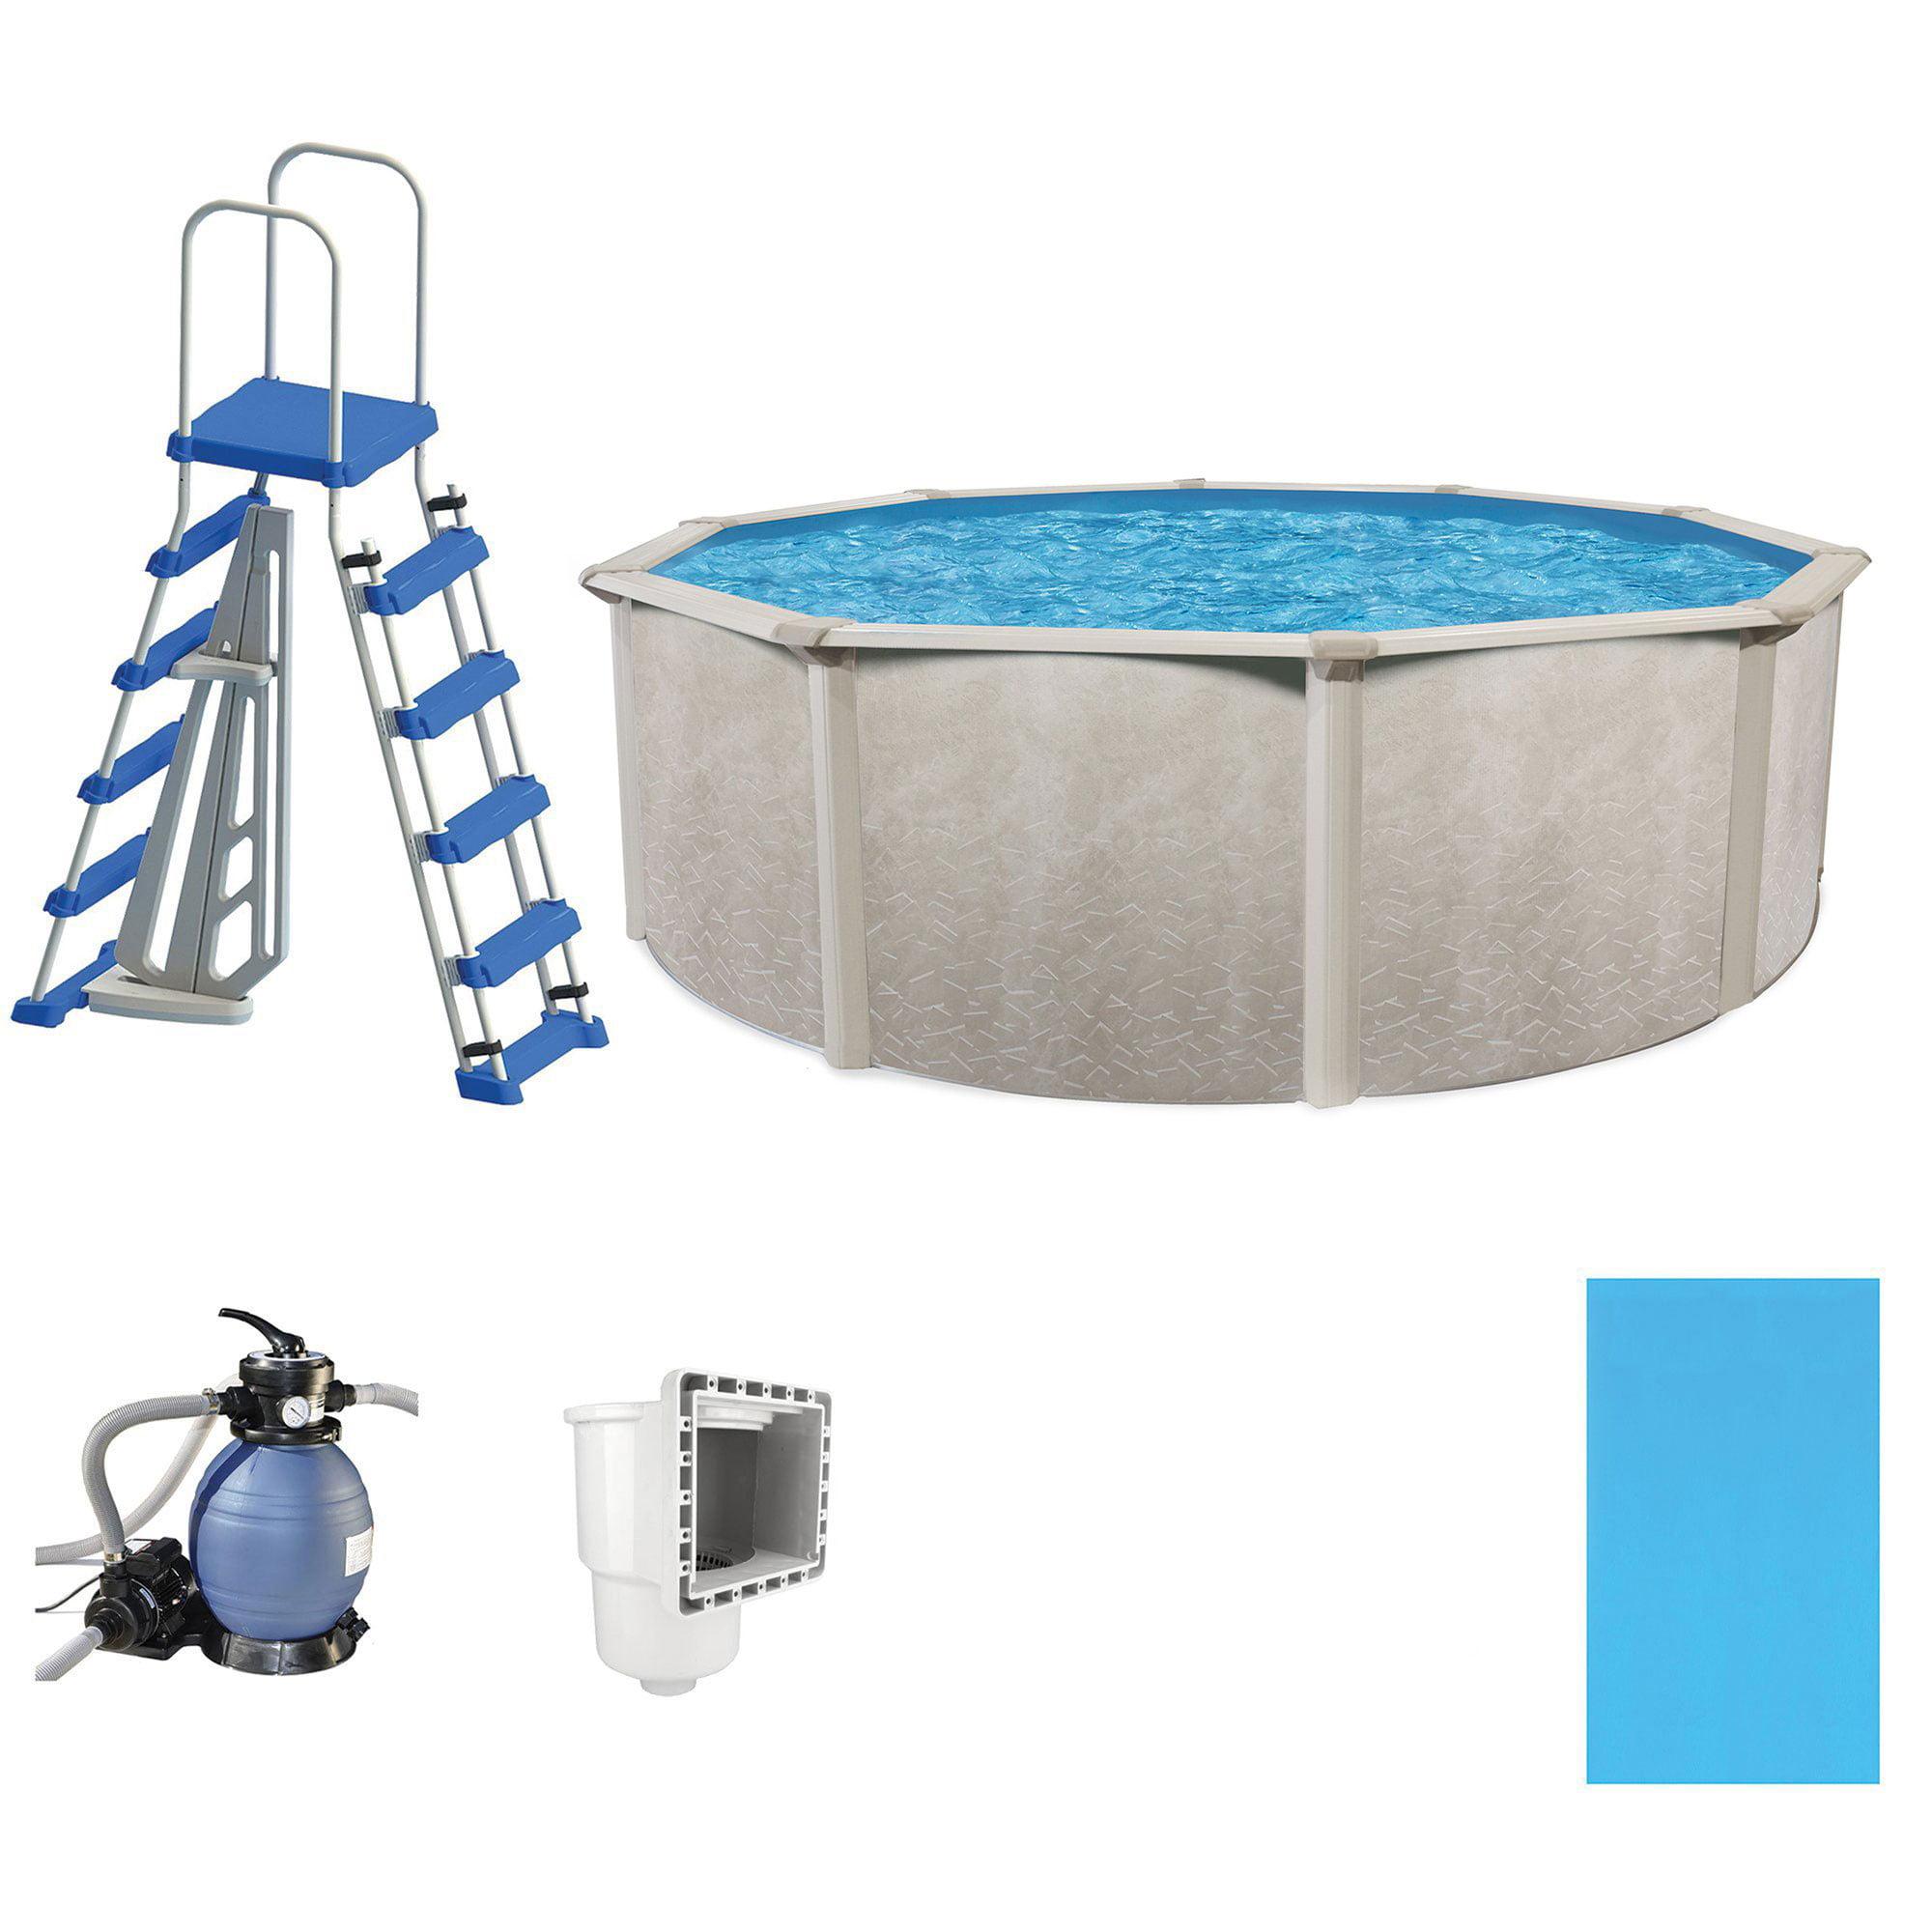 Cornelius pools phoenix 21 39 x 52 frame above ground pool for Garden swimming pool kits